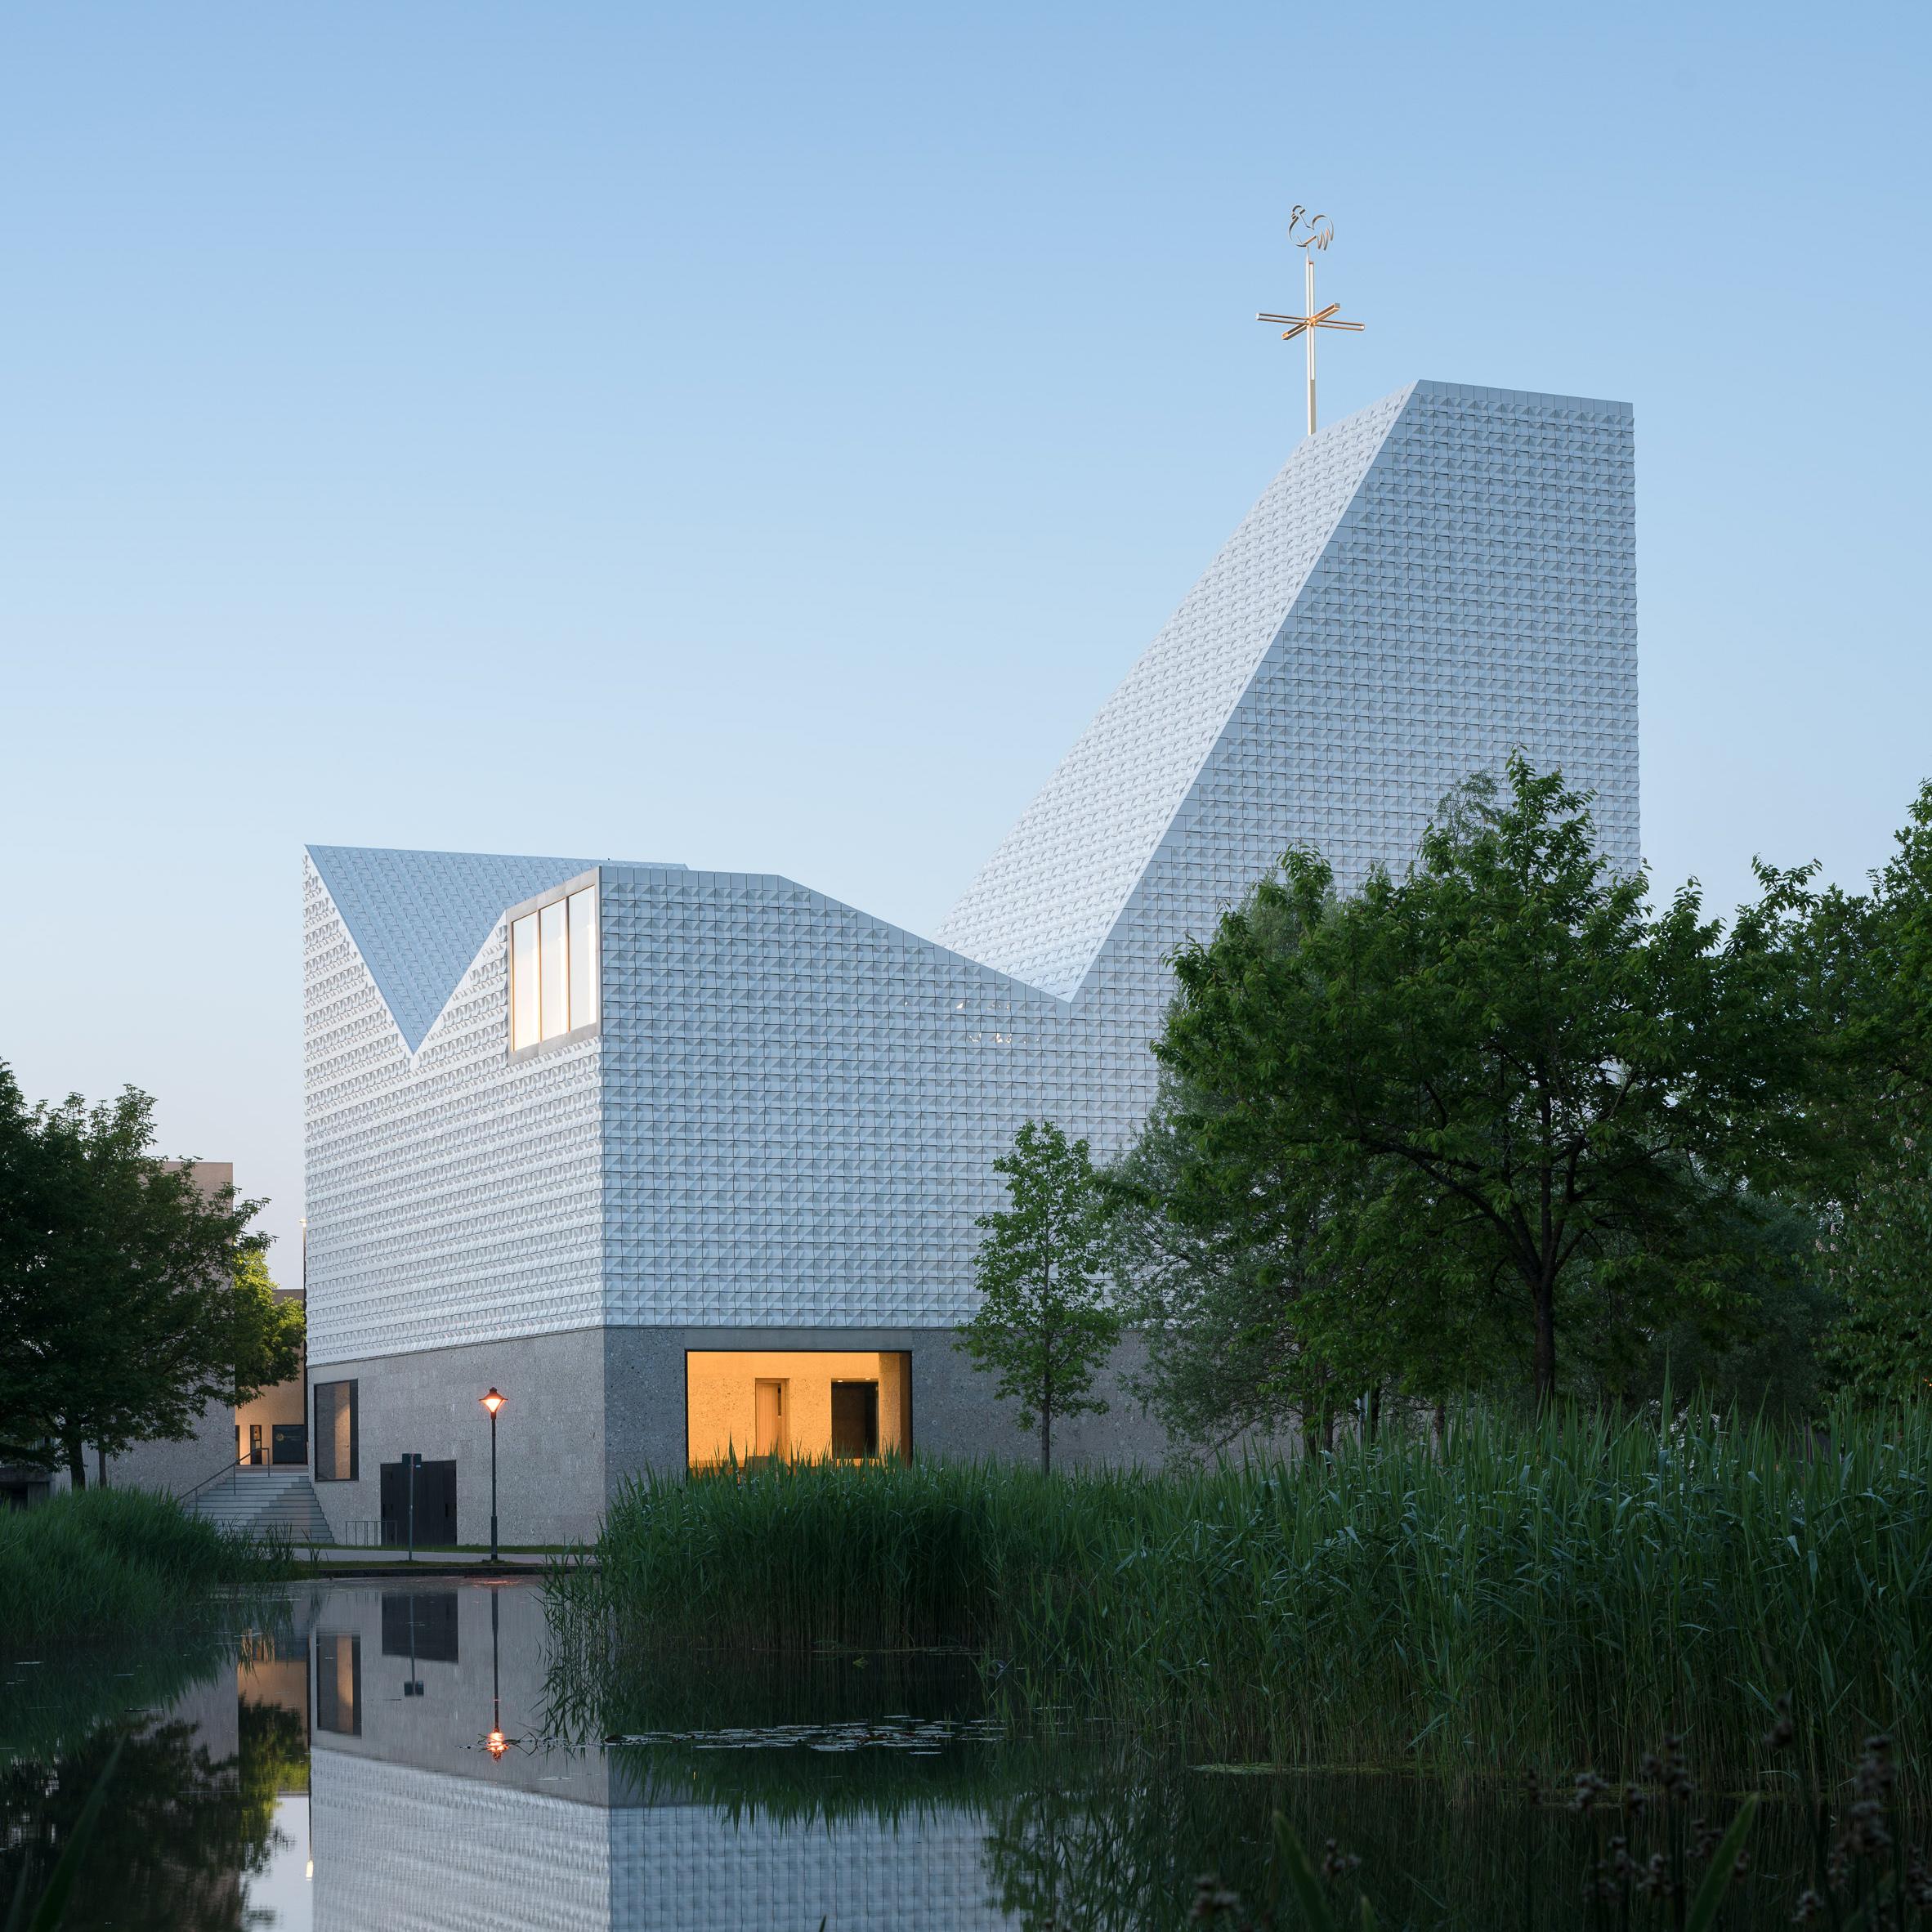 Dezeen's top 10 churches and chapels of 2019